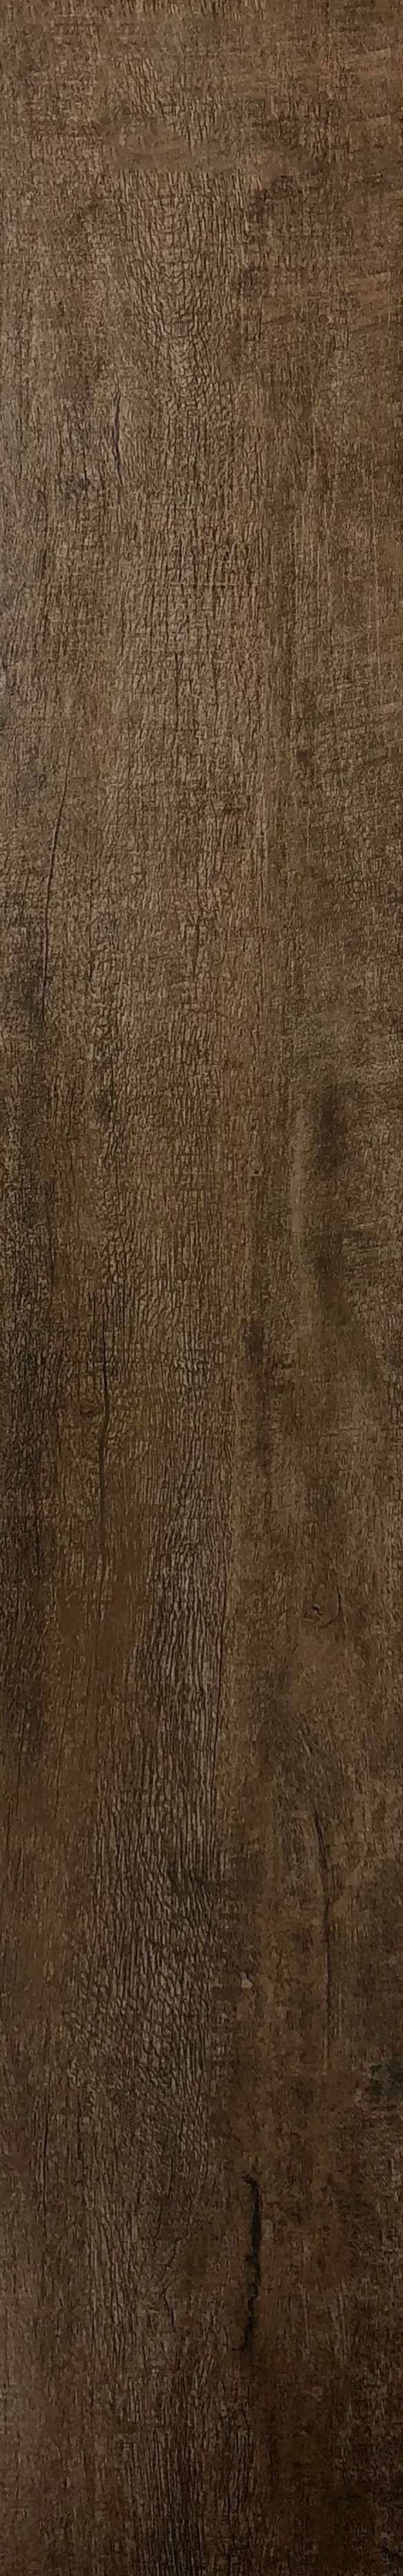 "Item #14207 - 6"" x 36"" Babylon Susa Porcelain Plank Image"